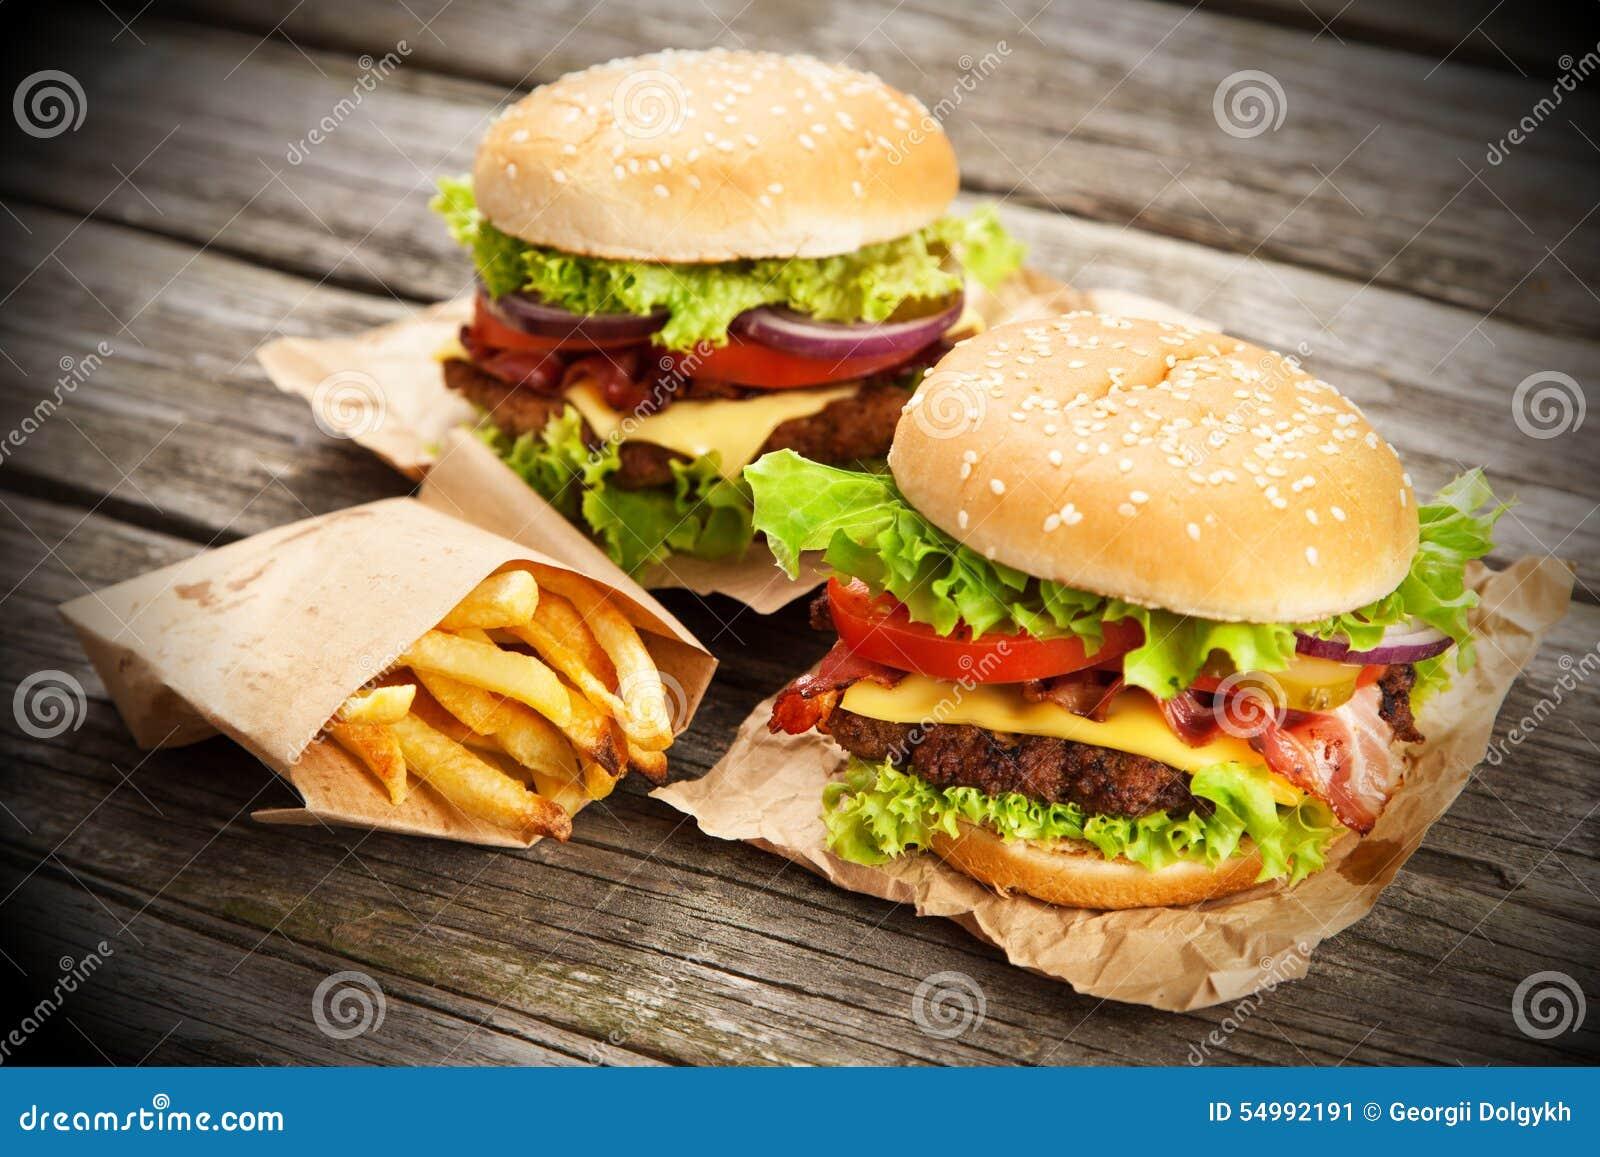 Очень вкусный гамбургер и фраи